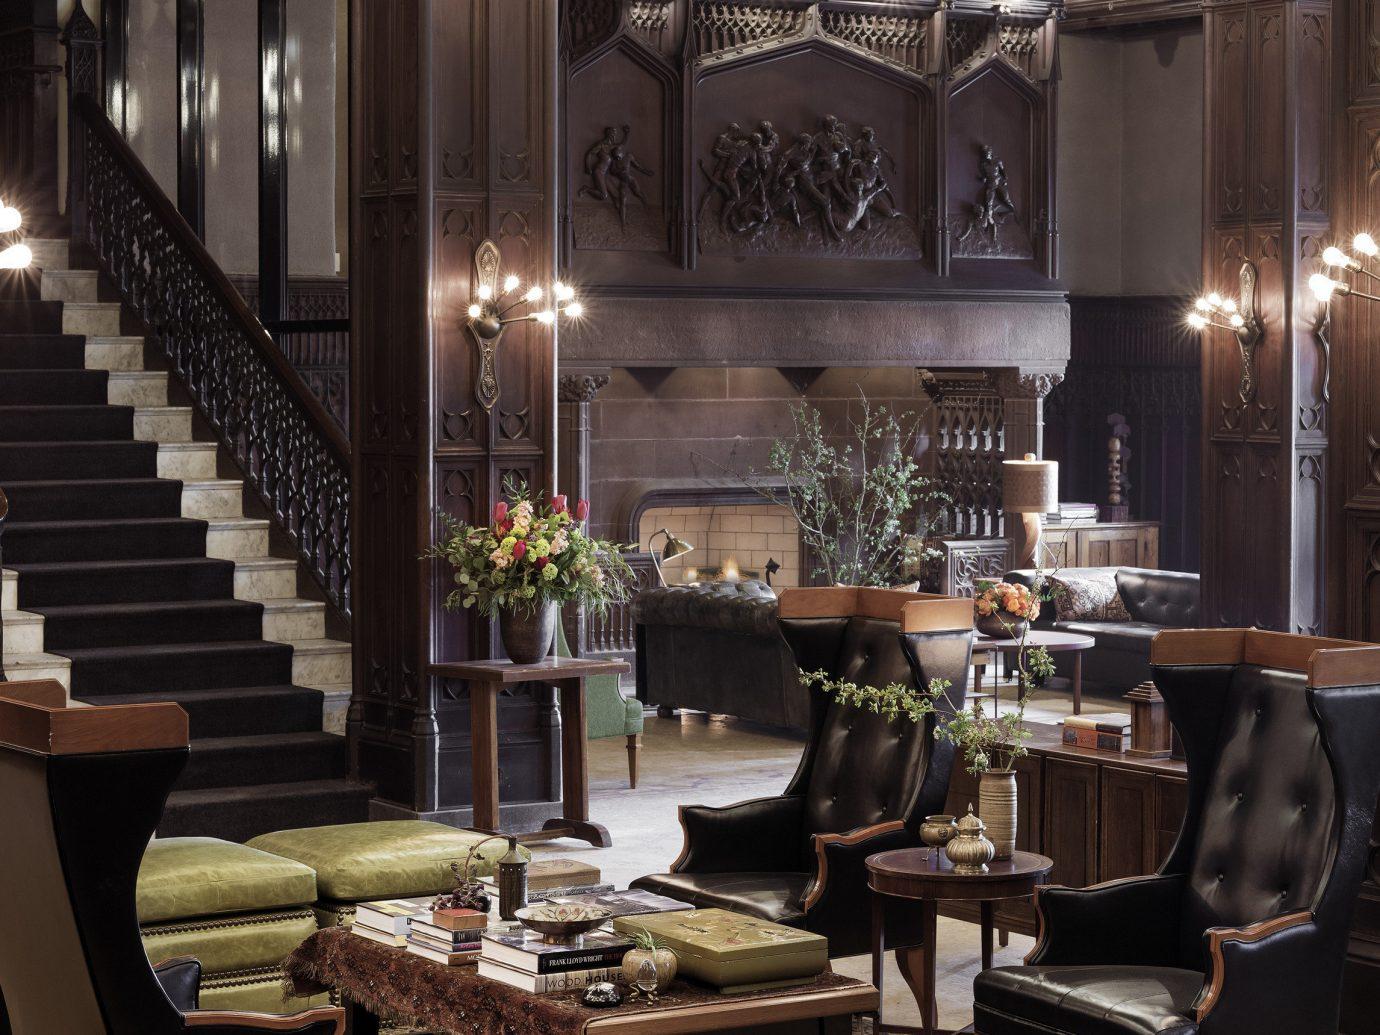 Trip Ideas indoor room ceiling Lobby interior design estate dining room home restaurant living room meal furniture several